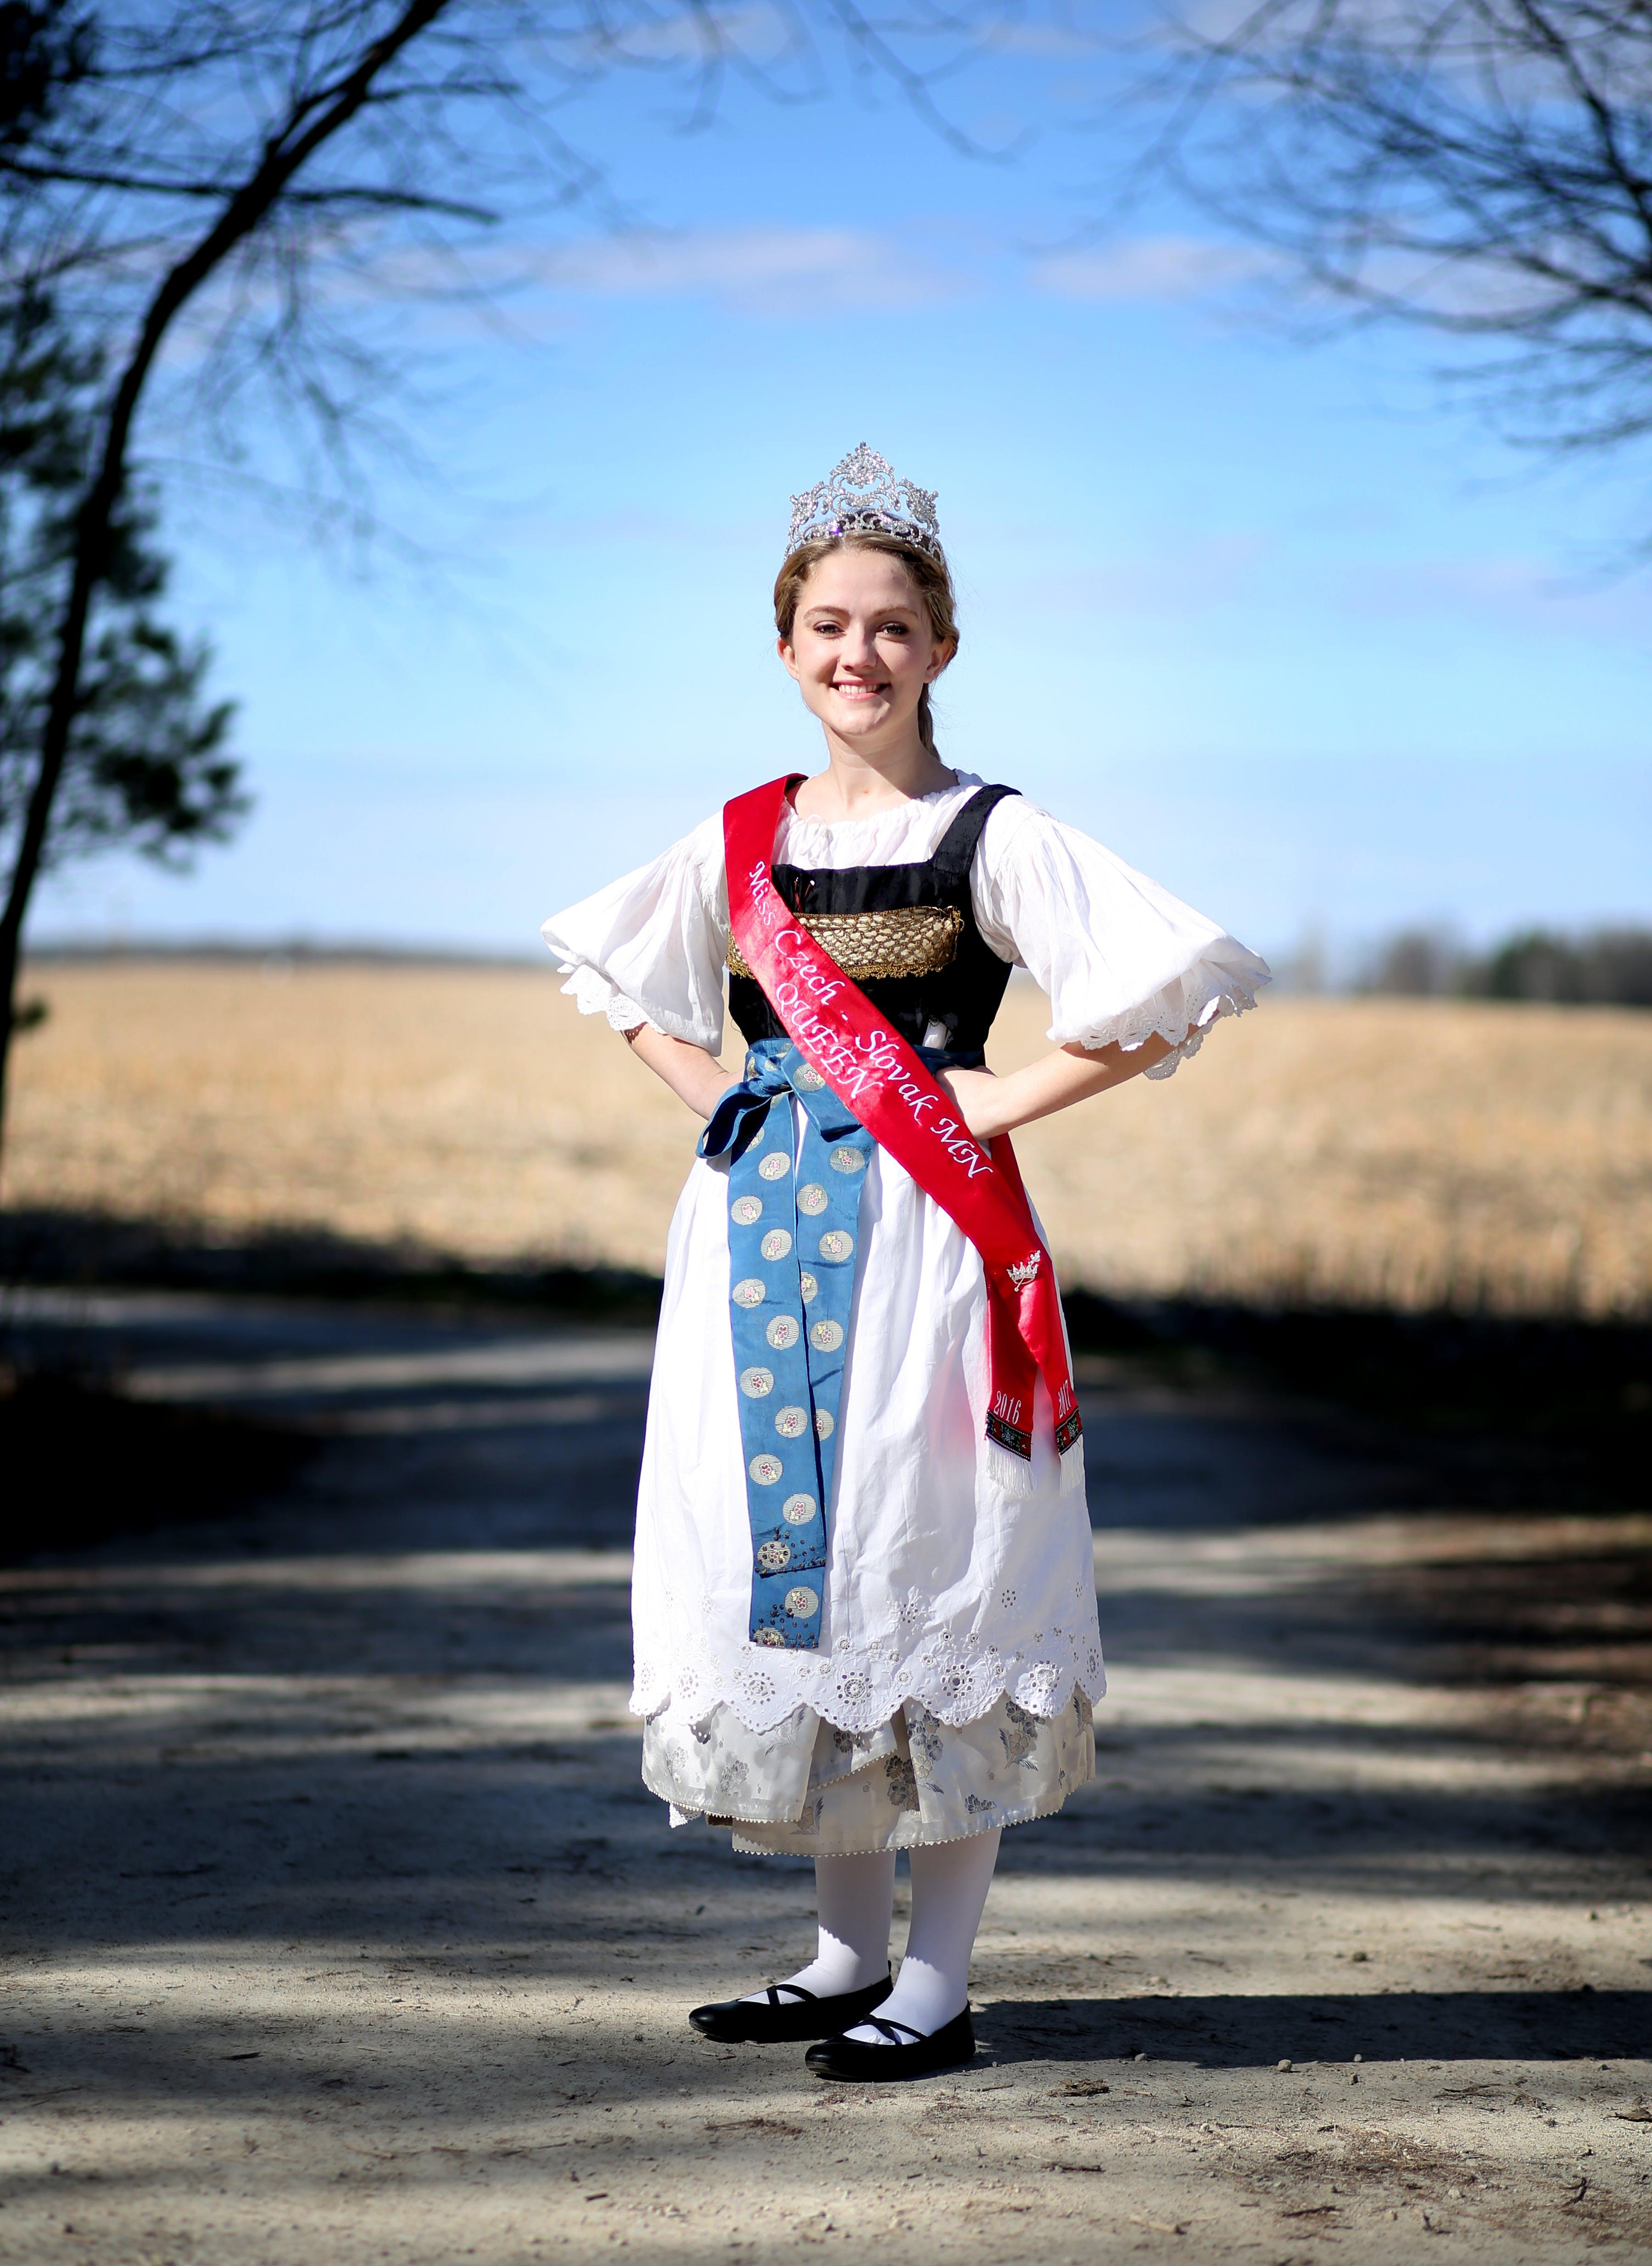 New Prague still revels in its Czech roots. Miss Czech Slovak pageant winner Alexa Turgeon is pictured in 2016.